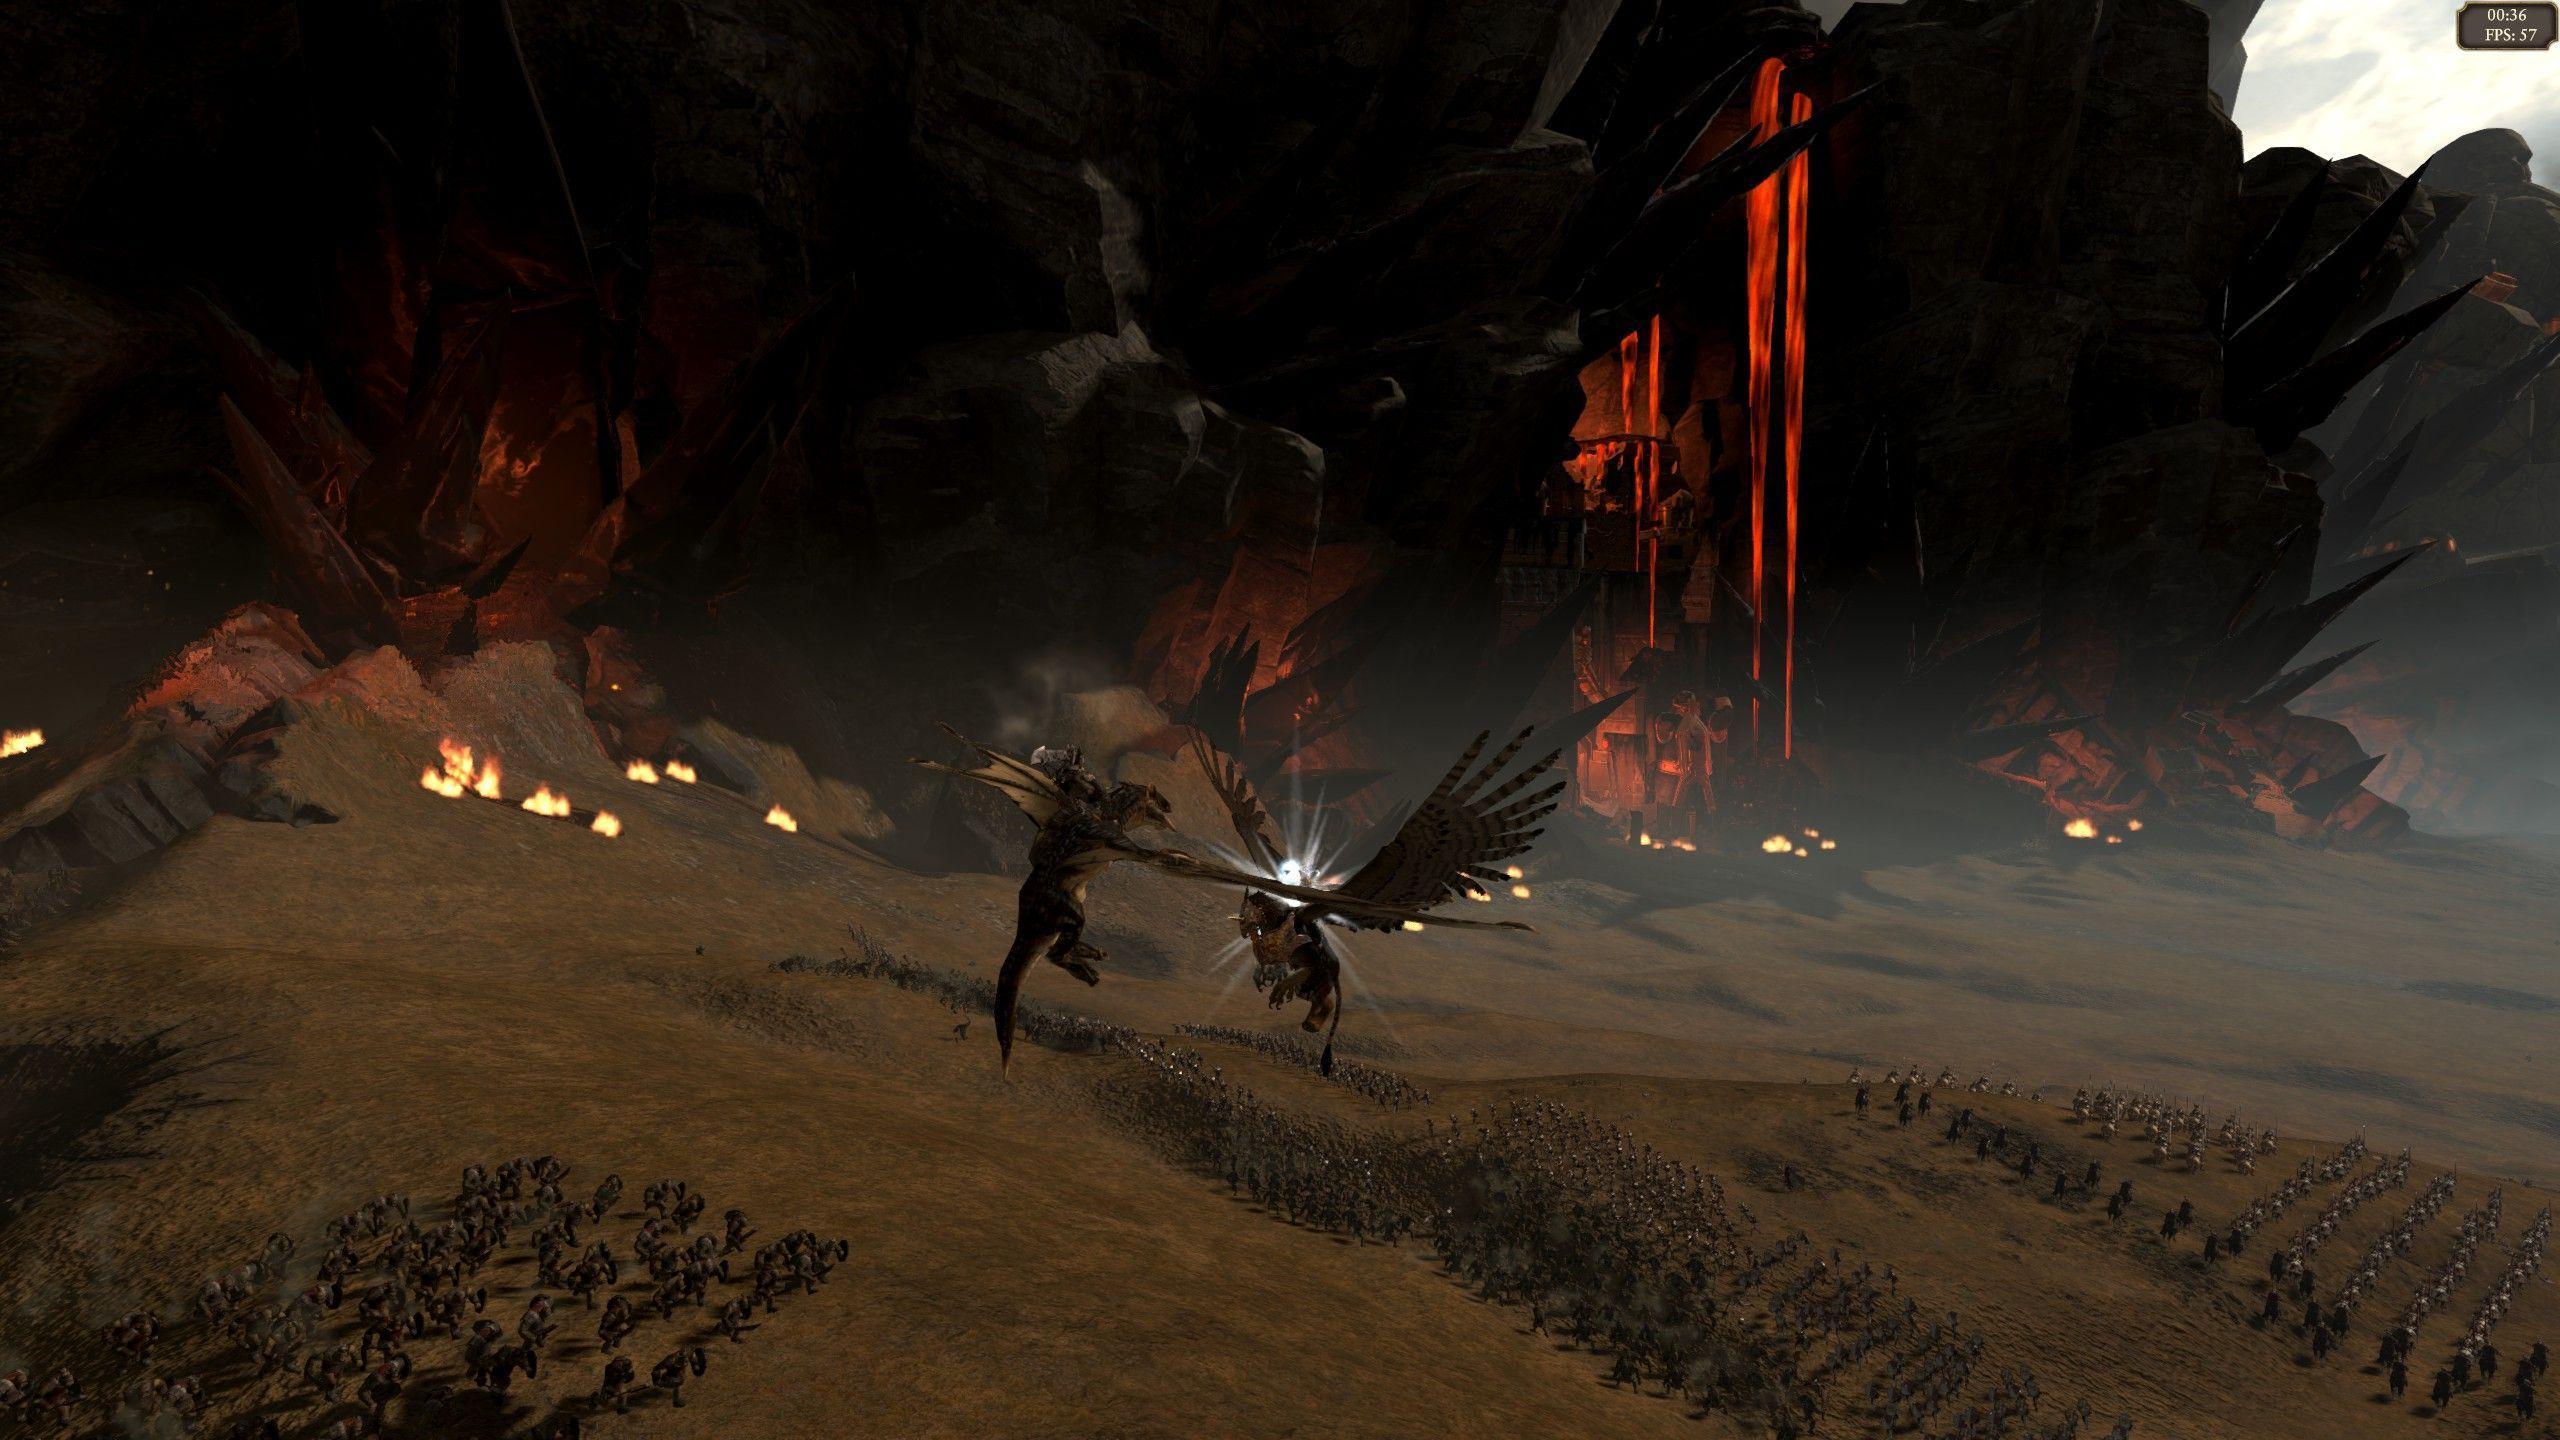 Total War: Warhammer DirectX 12 performance preview: Radeon